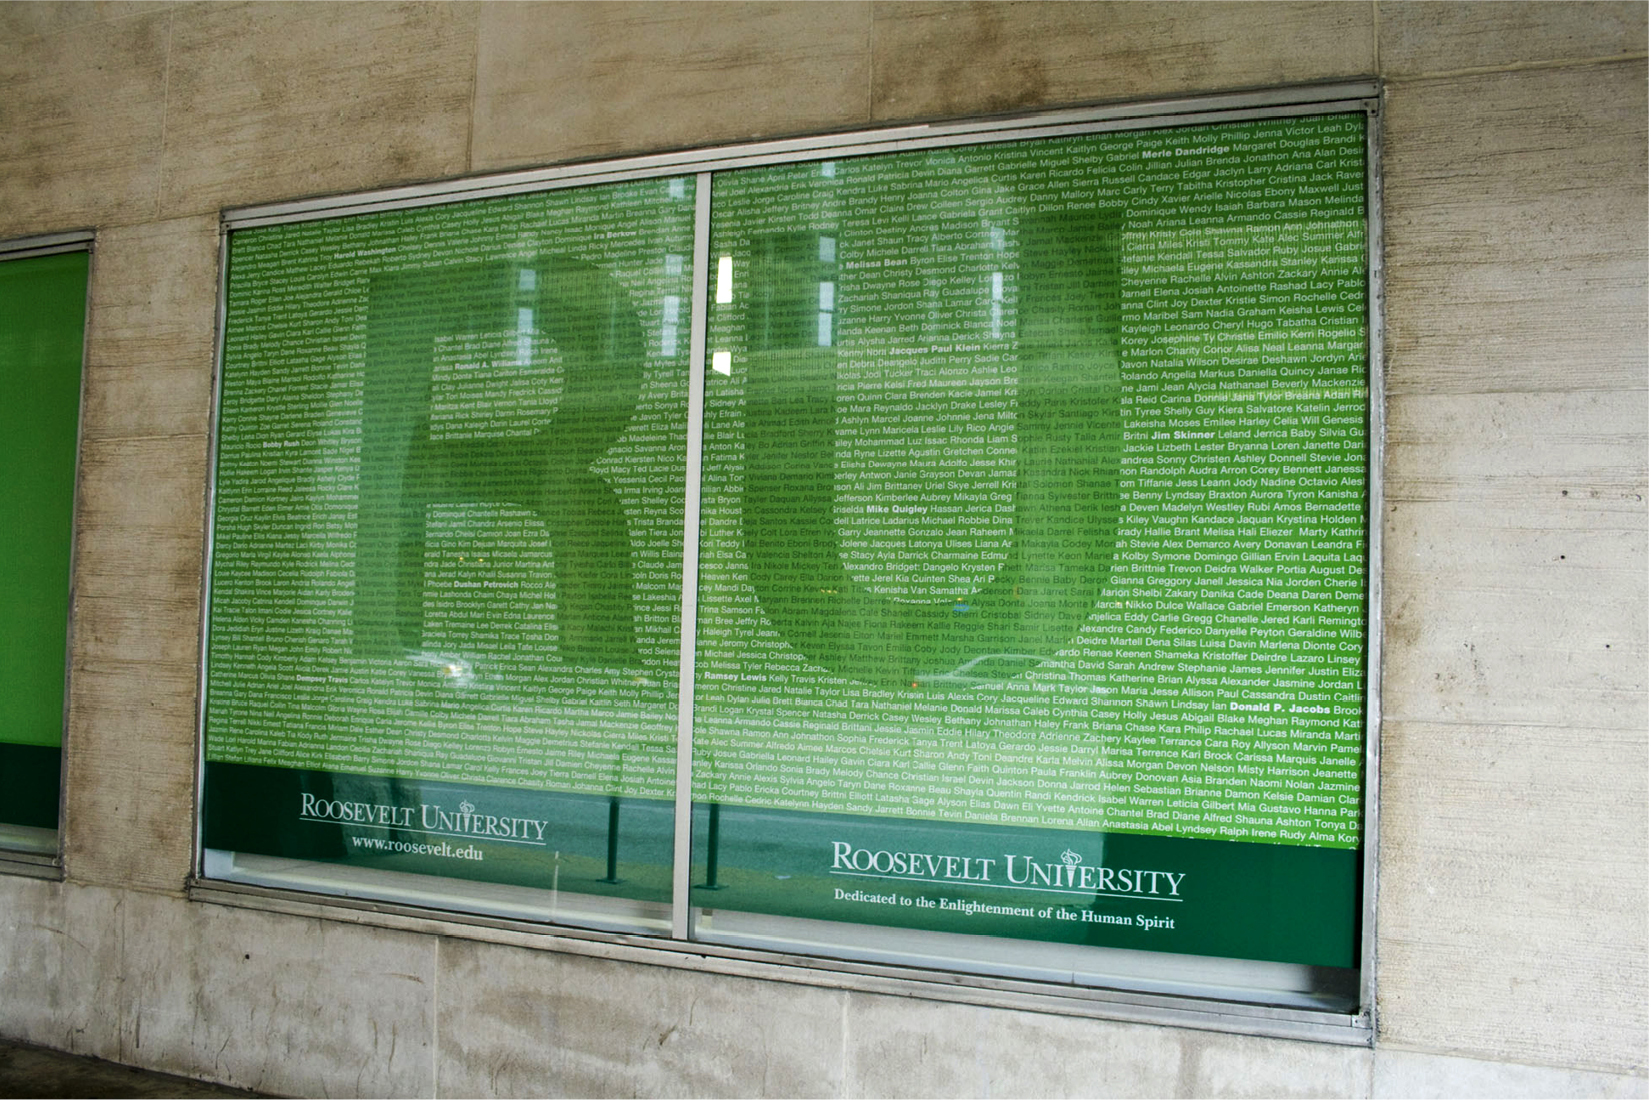 RU_windows&banners_11.11.1313.jpg